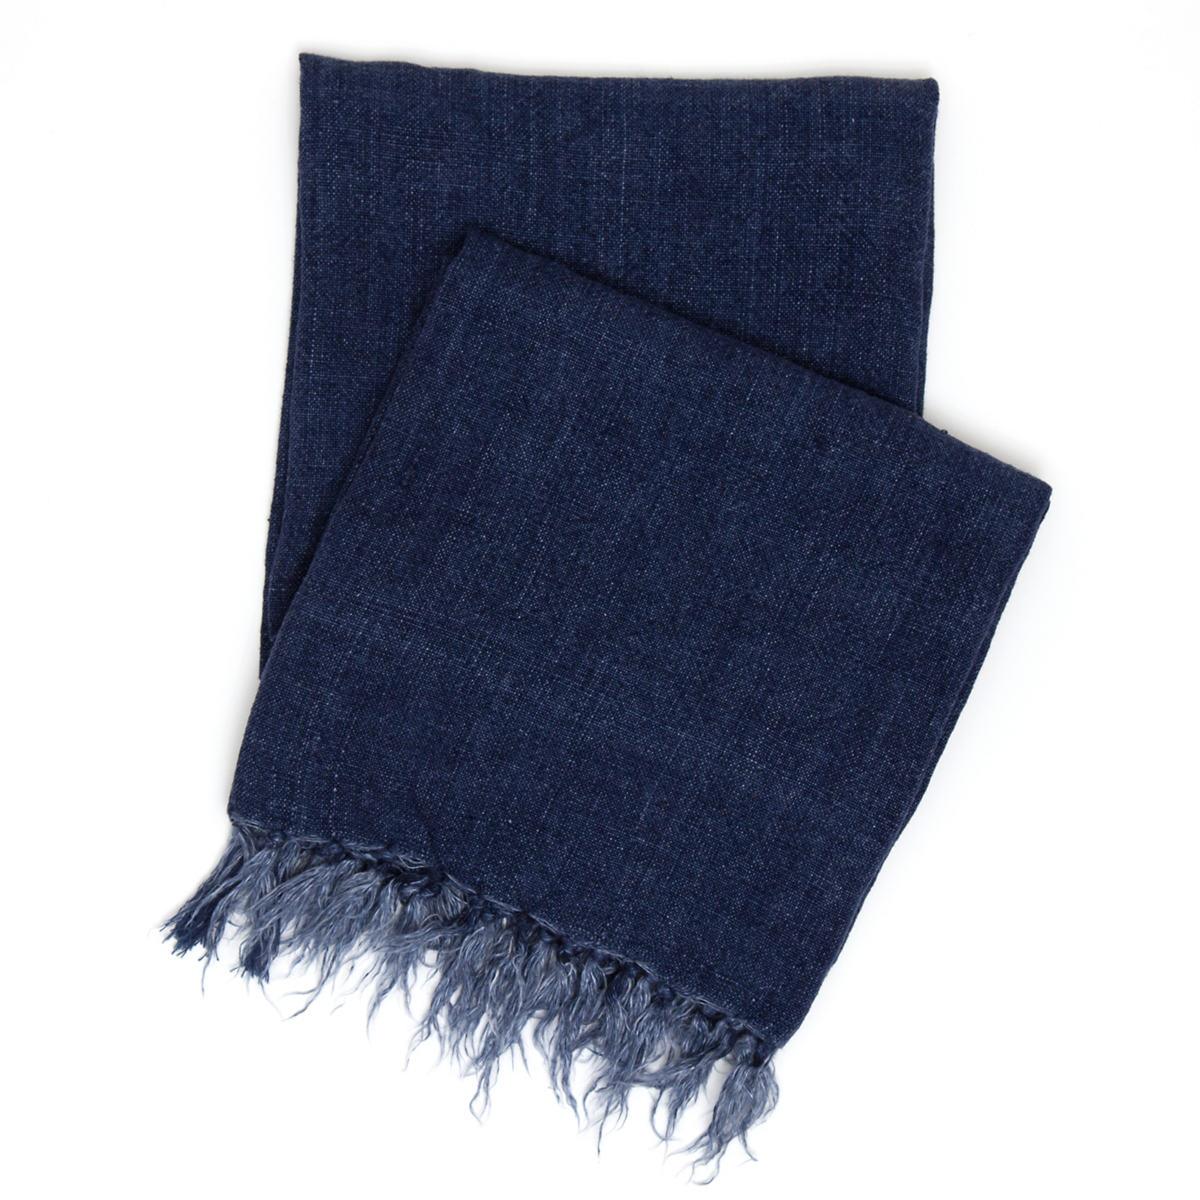 Laundered Linen Indigo Throw